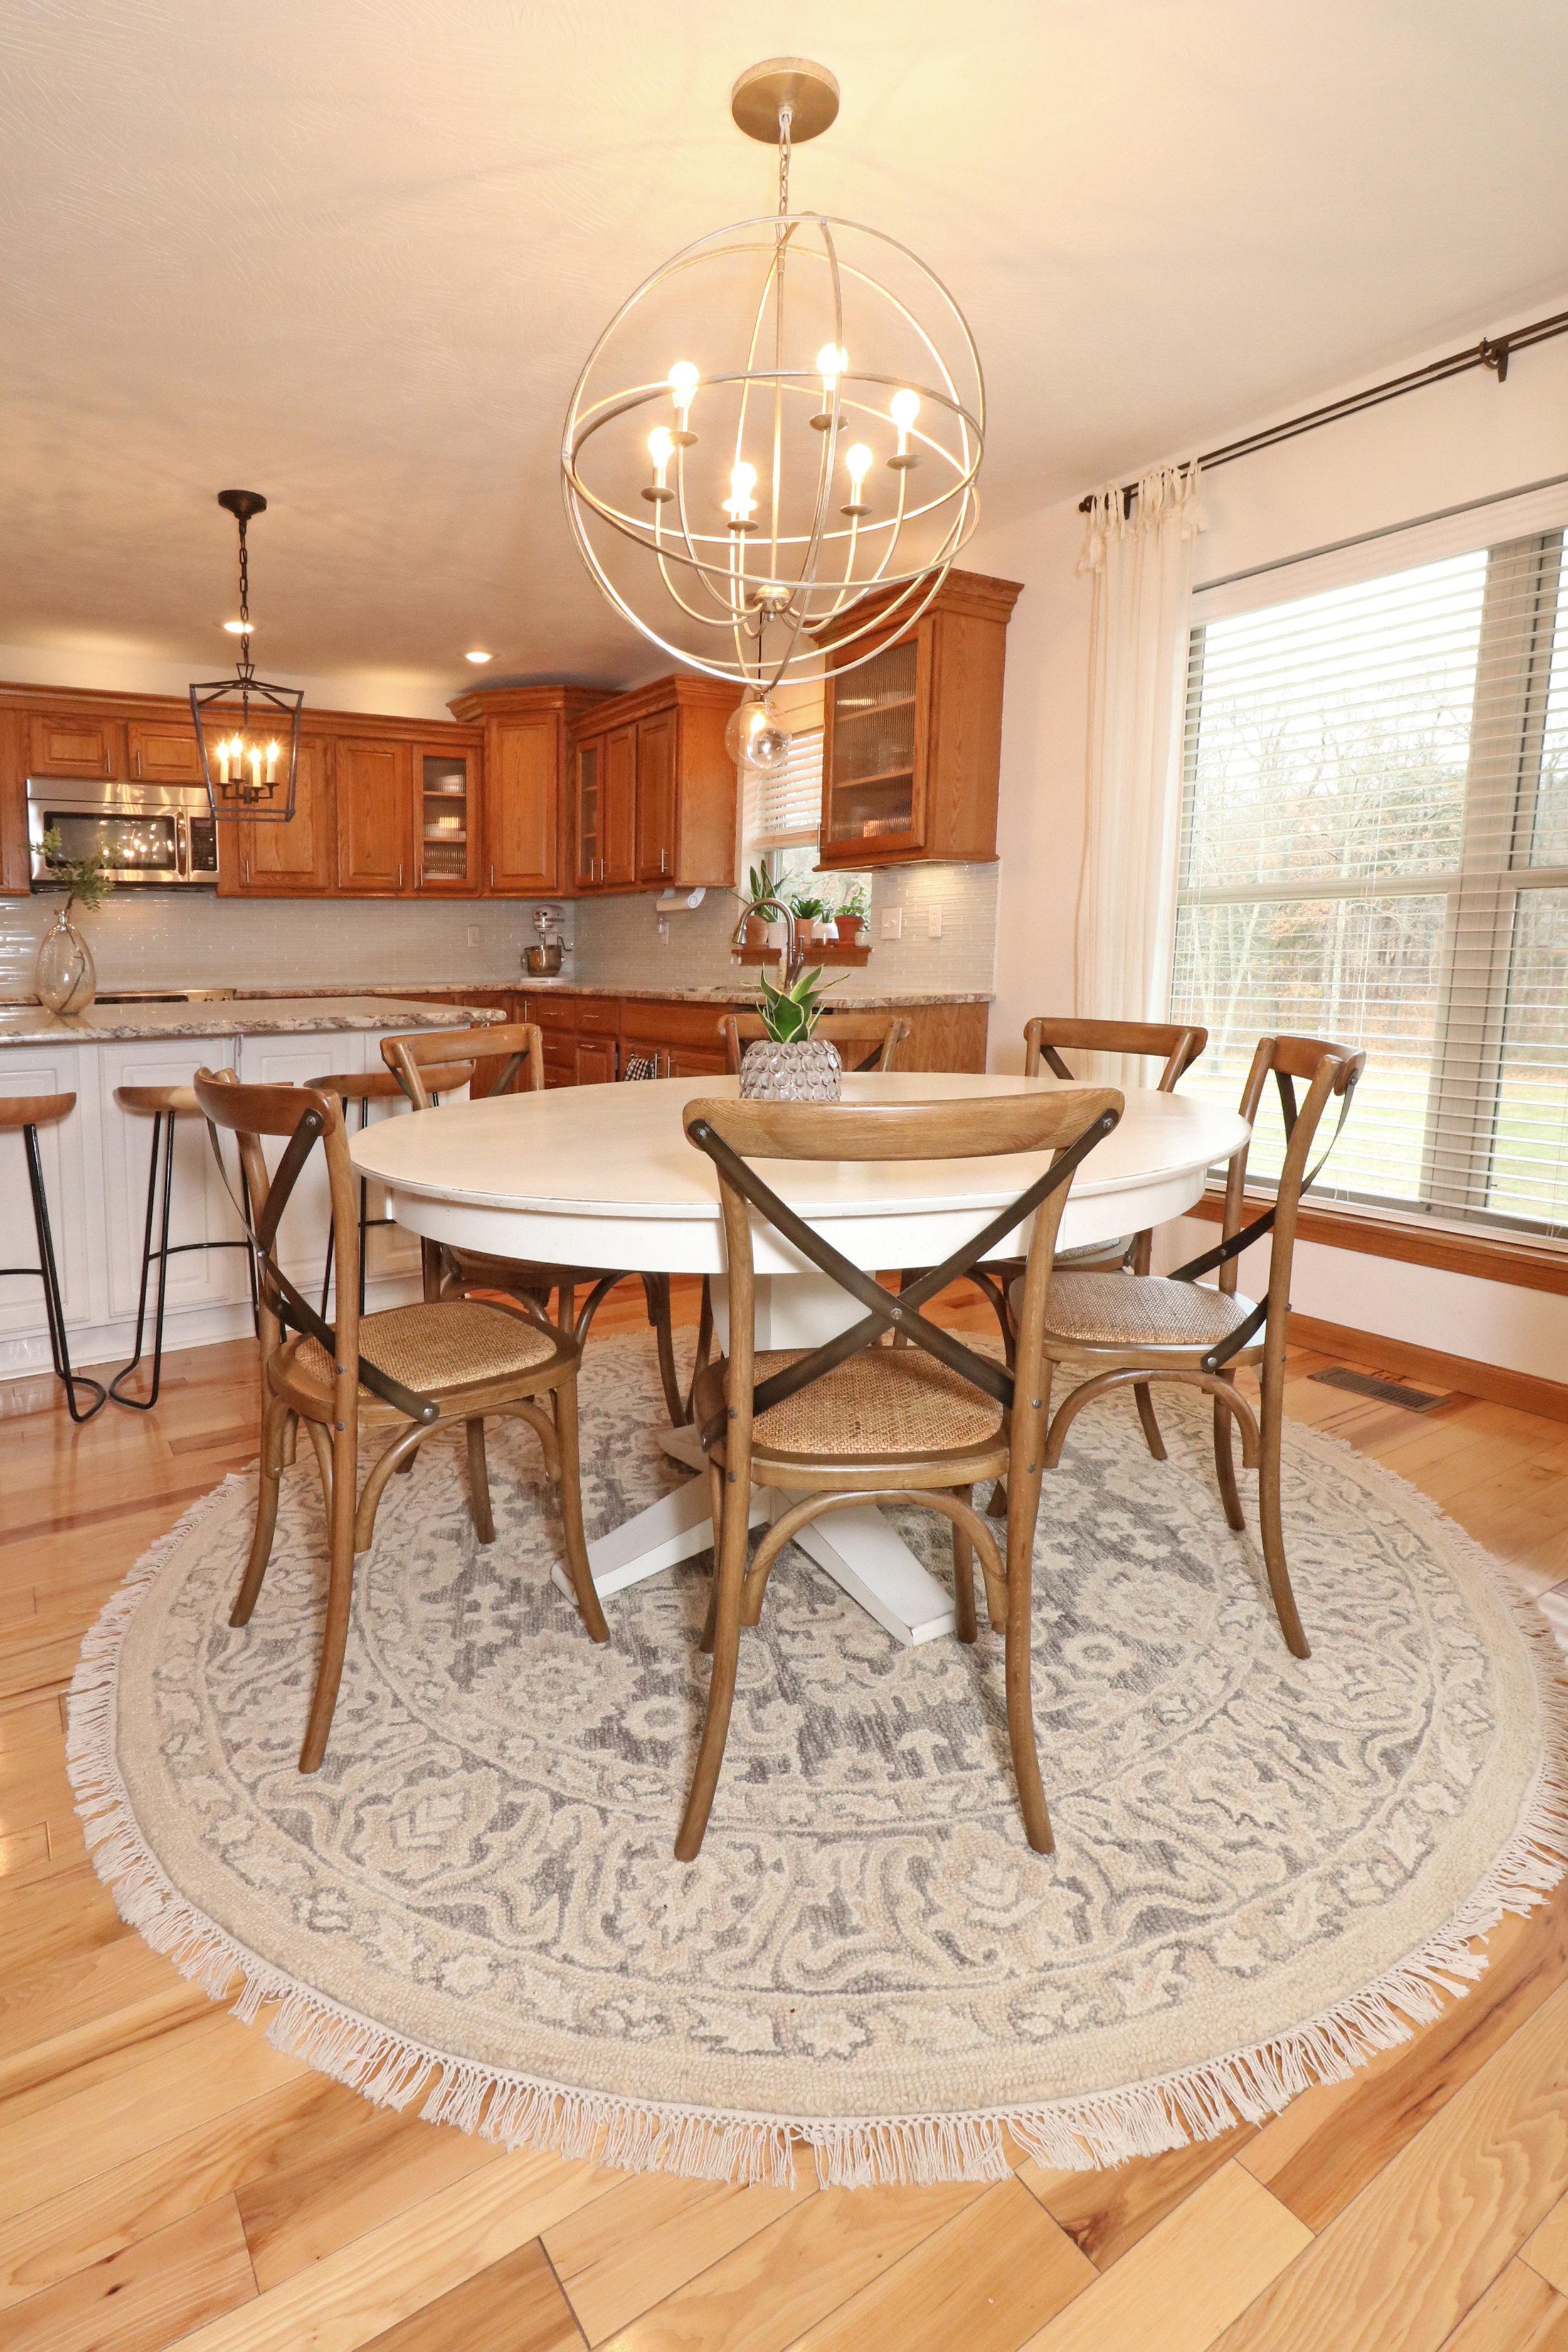 Magnolia Home - Hanover - Granite | Granite